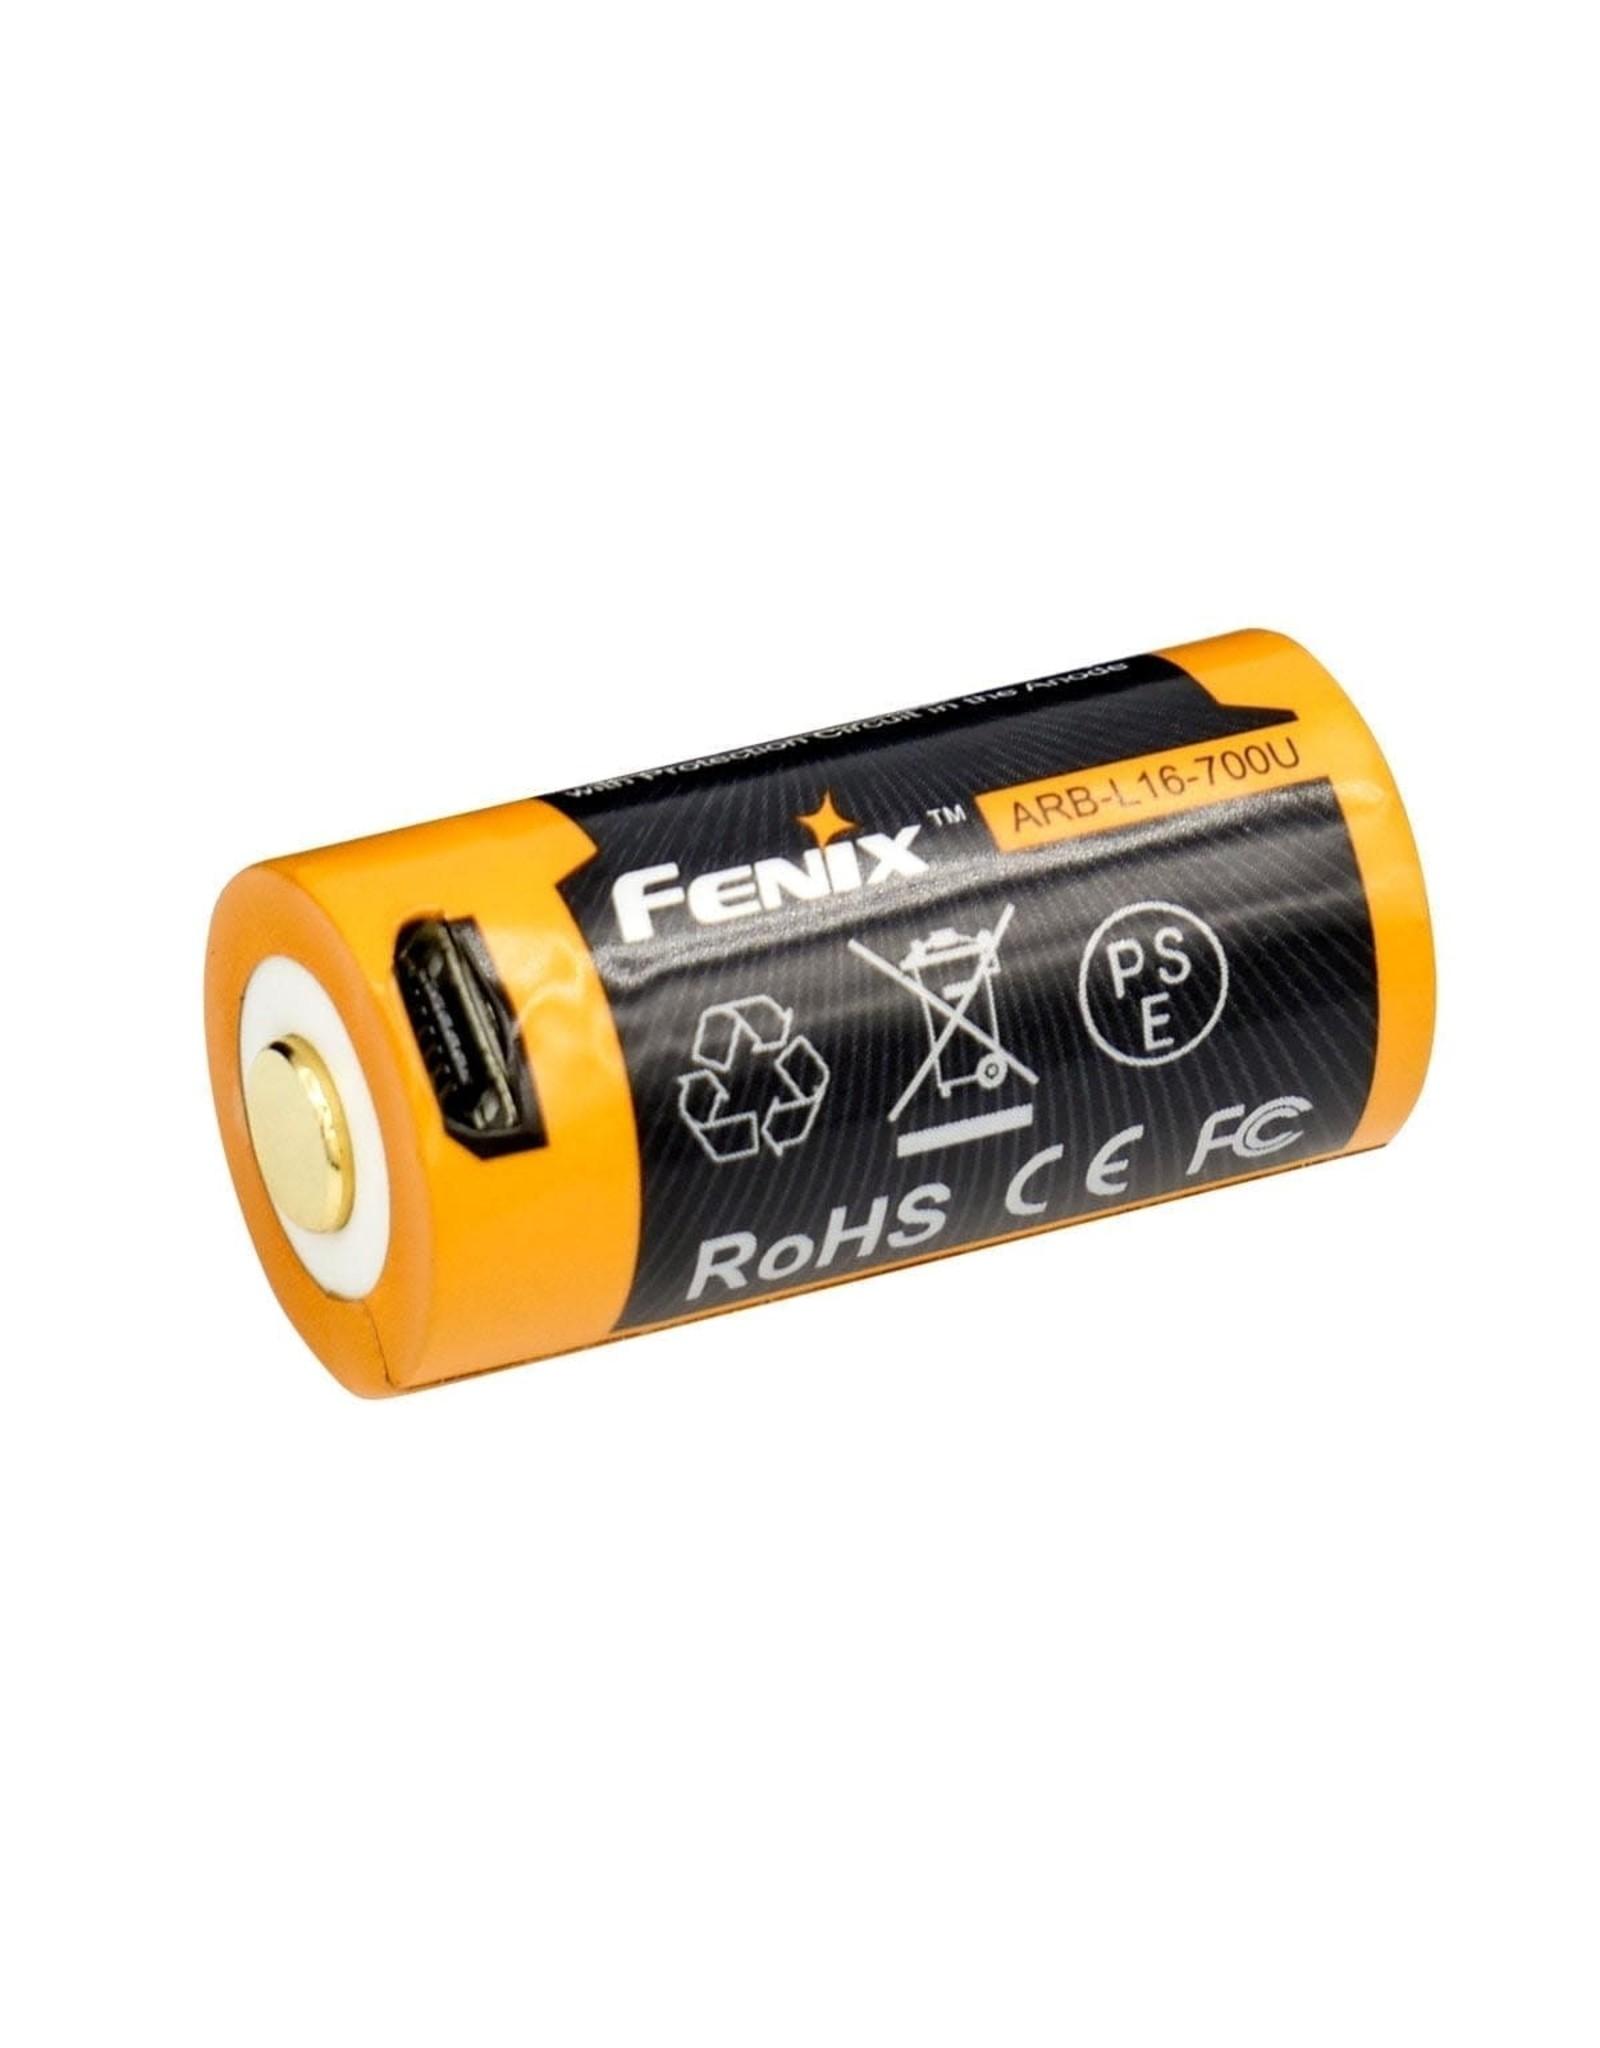 FENIX FENIX ARB-L16-700U USB RECHARGABLE BATTERY